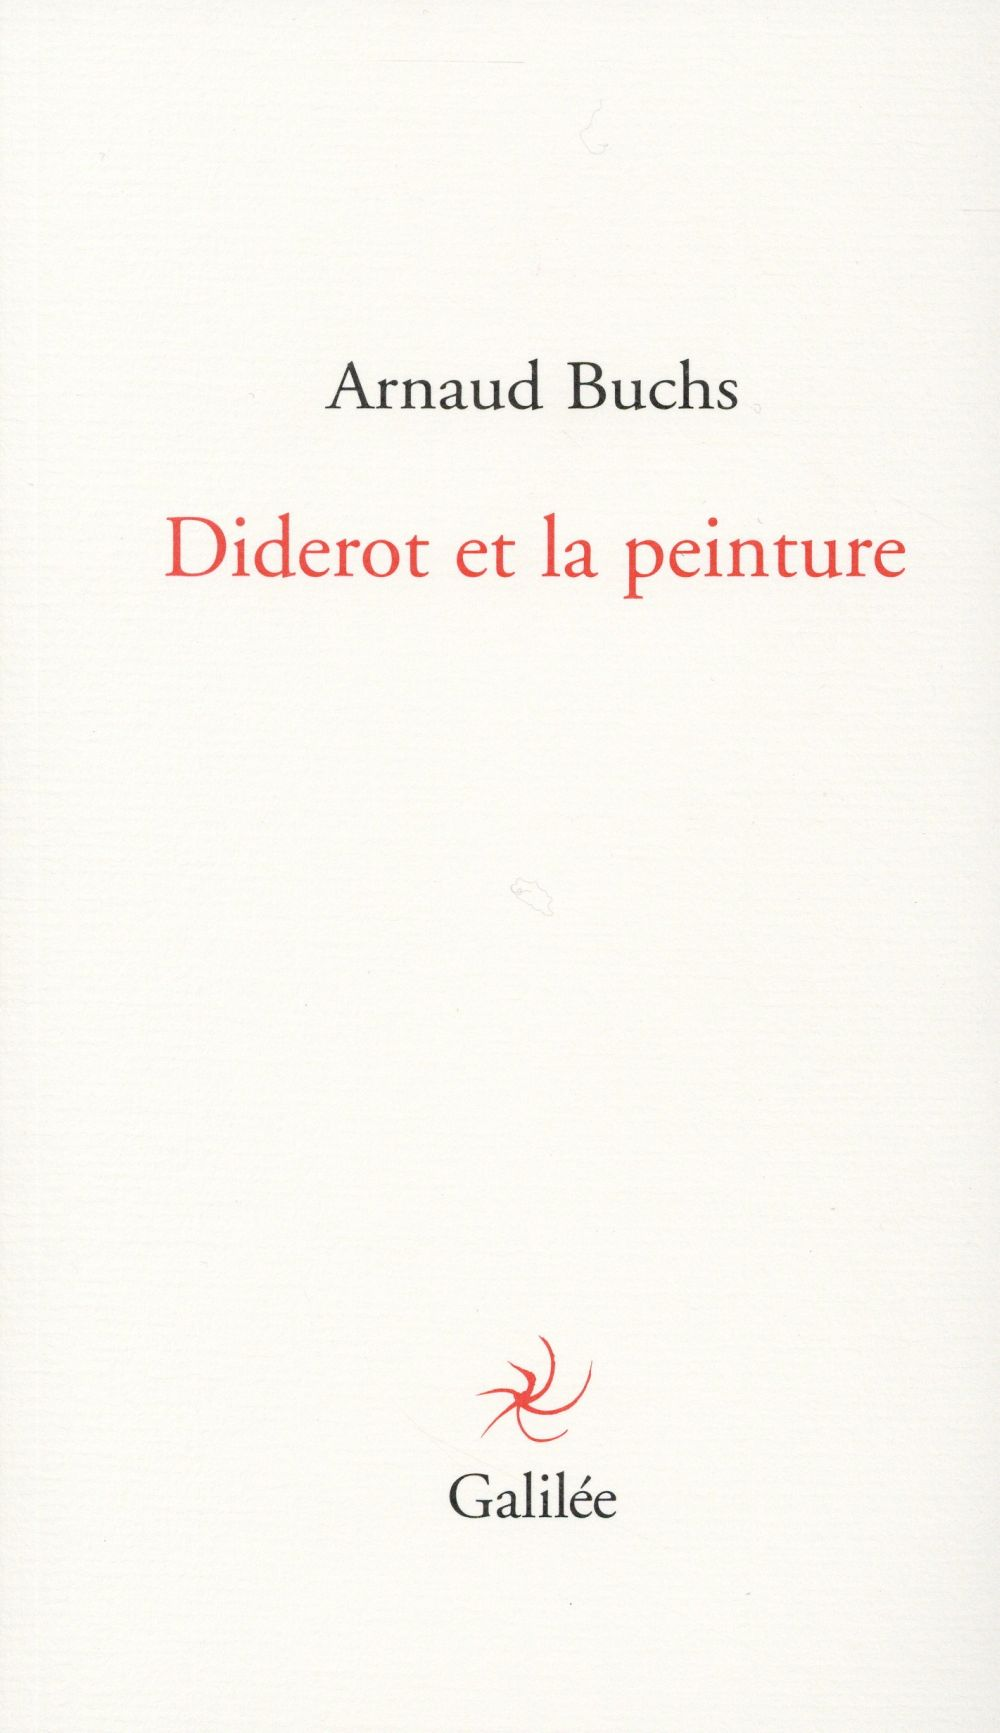 Diderot et la peinture